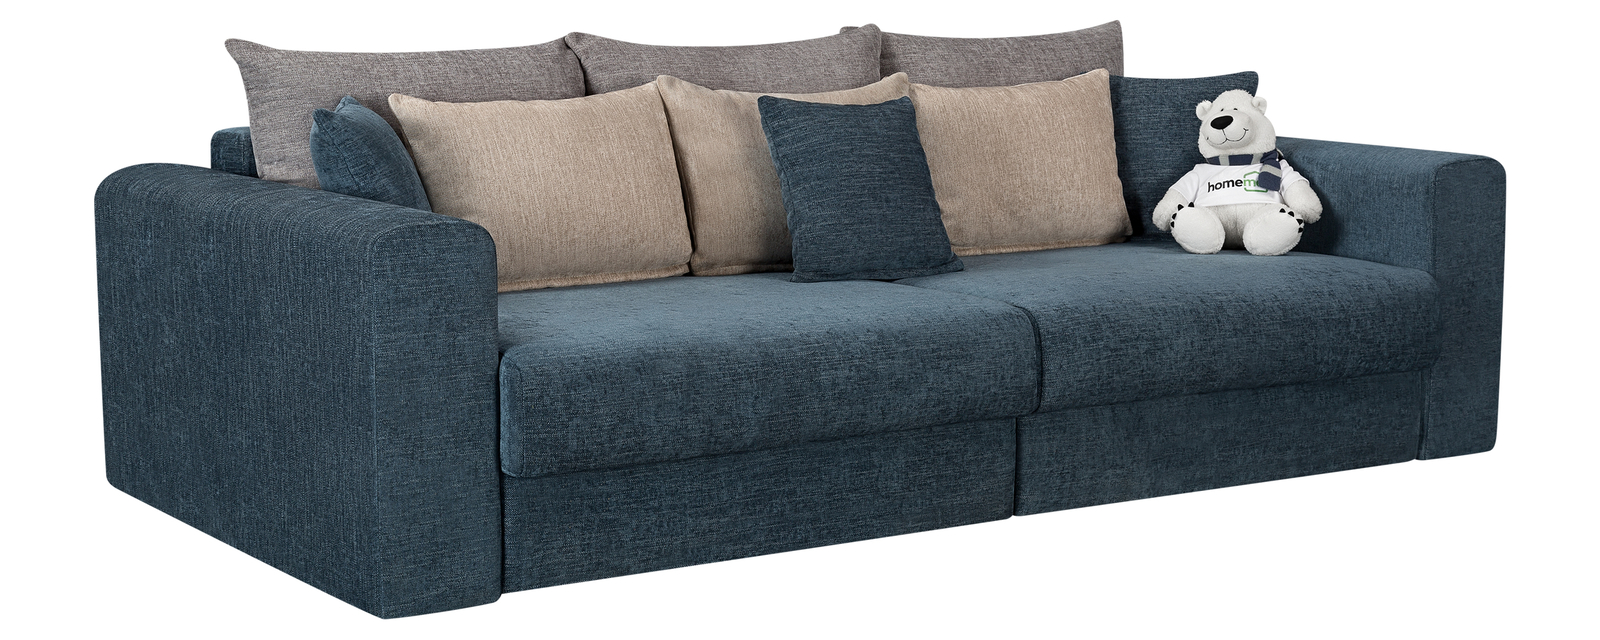 Модульный диван Медисон Вариант №4 Anabelle синий (Шенилл)